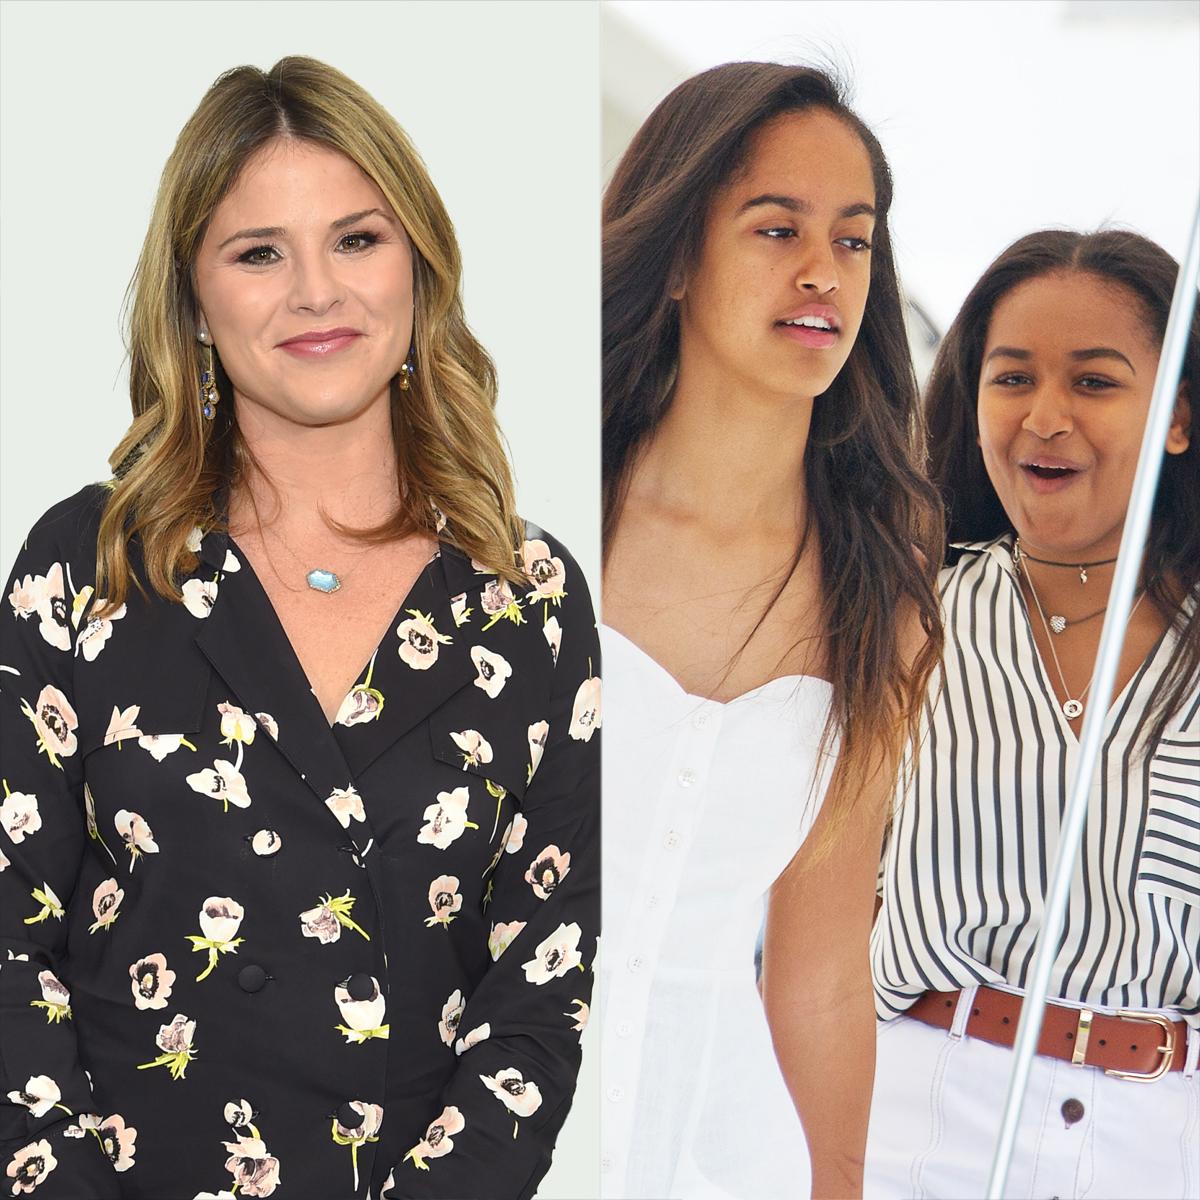 Inside Jenna Bush Hager's Sweet Bond With Fellow First Daughters Malia and Sasha Obama